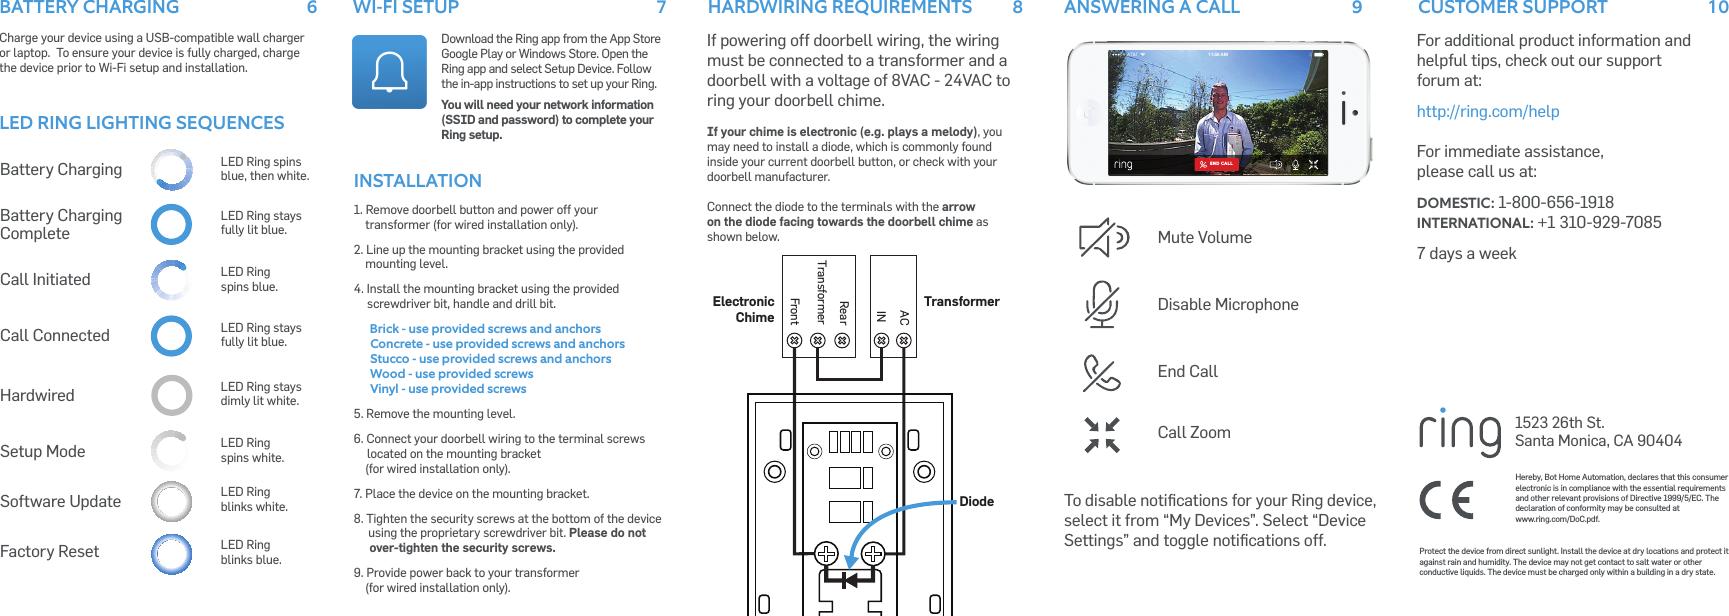 Ring BHARG031 Ring User Manual Ring Doorbell Users Manual 10 13